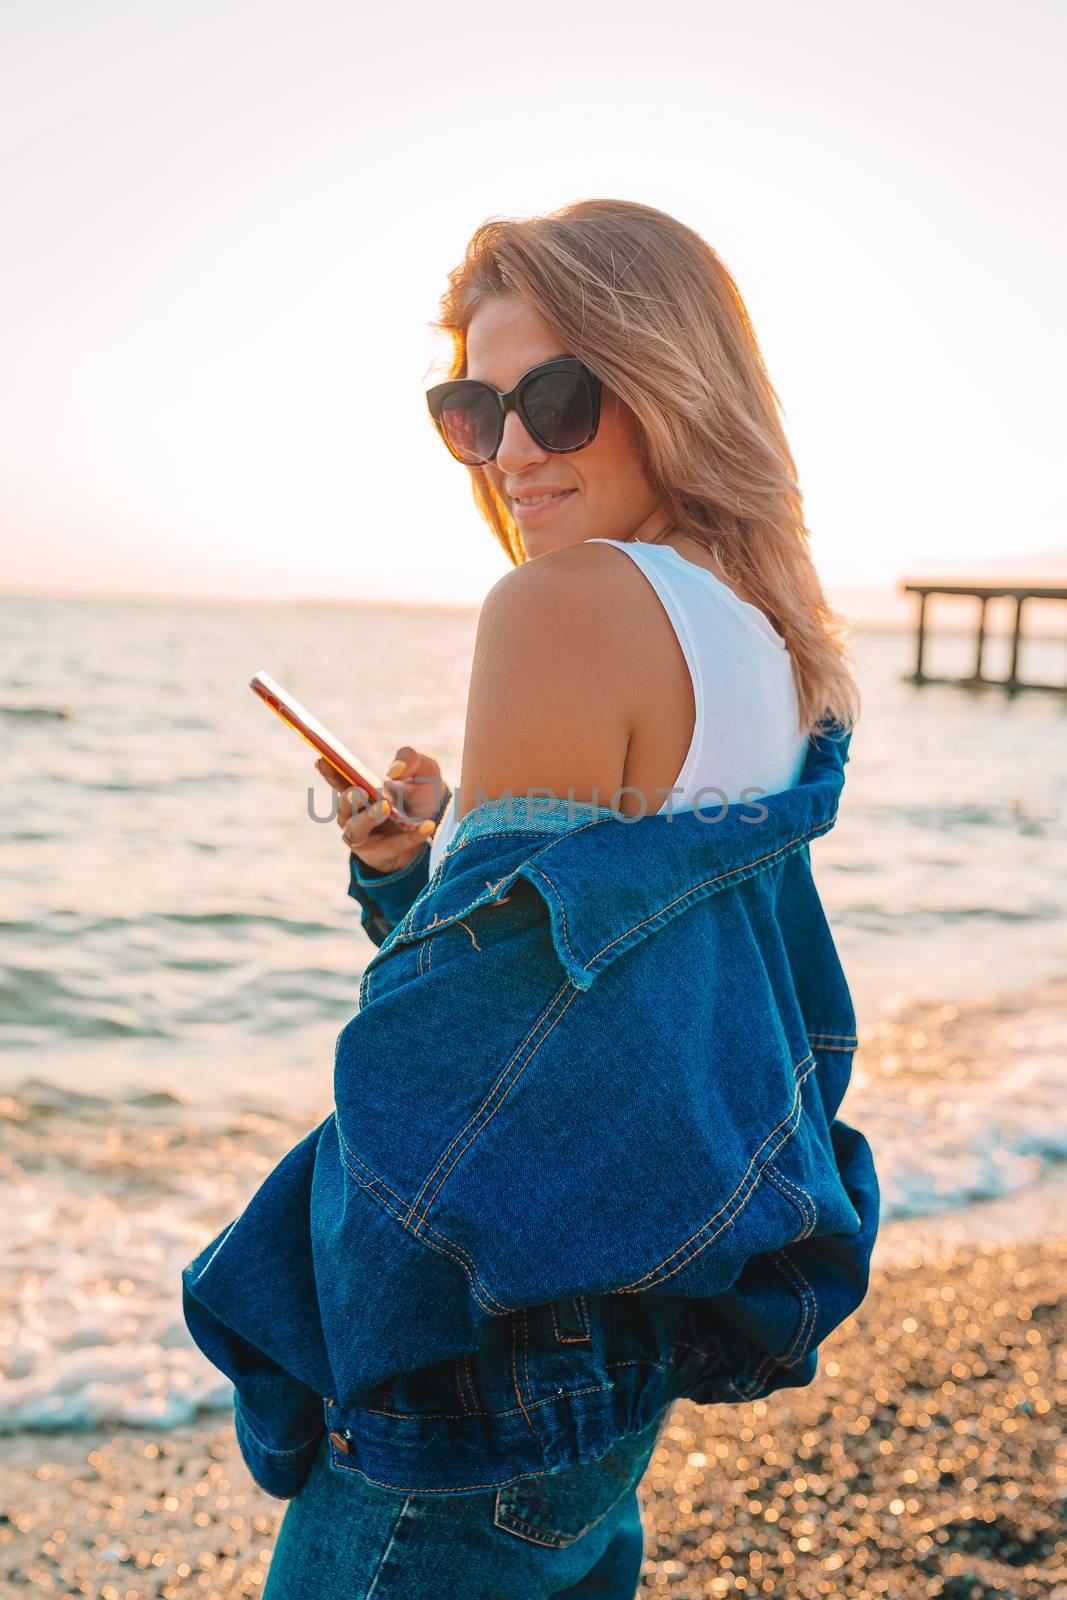 Fashion portrait of stylish girl on the beach.